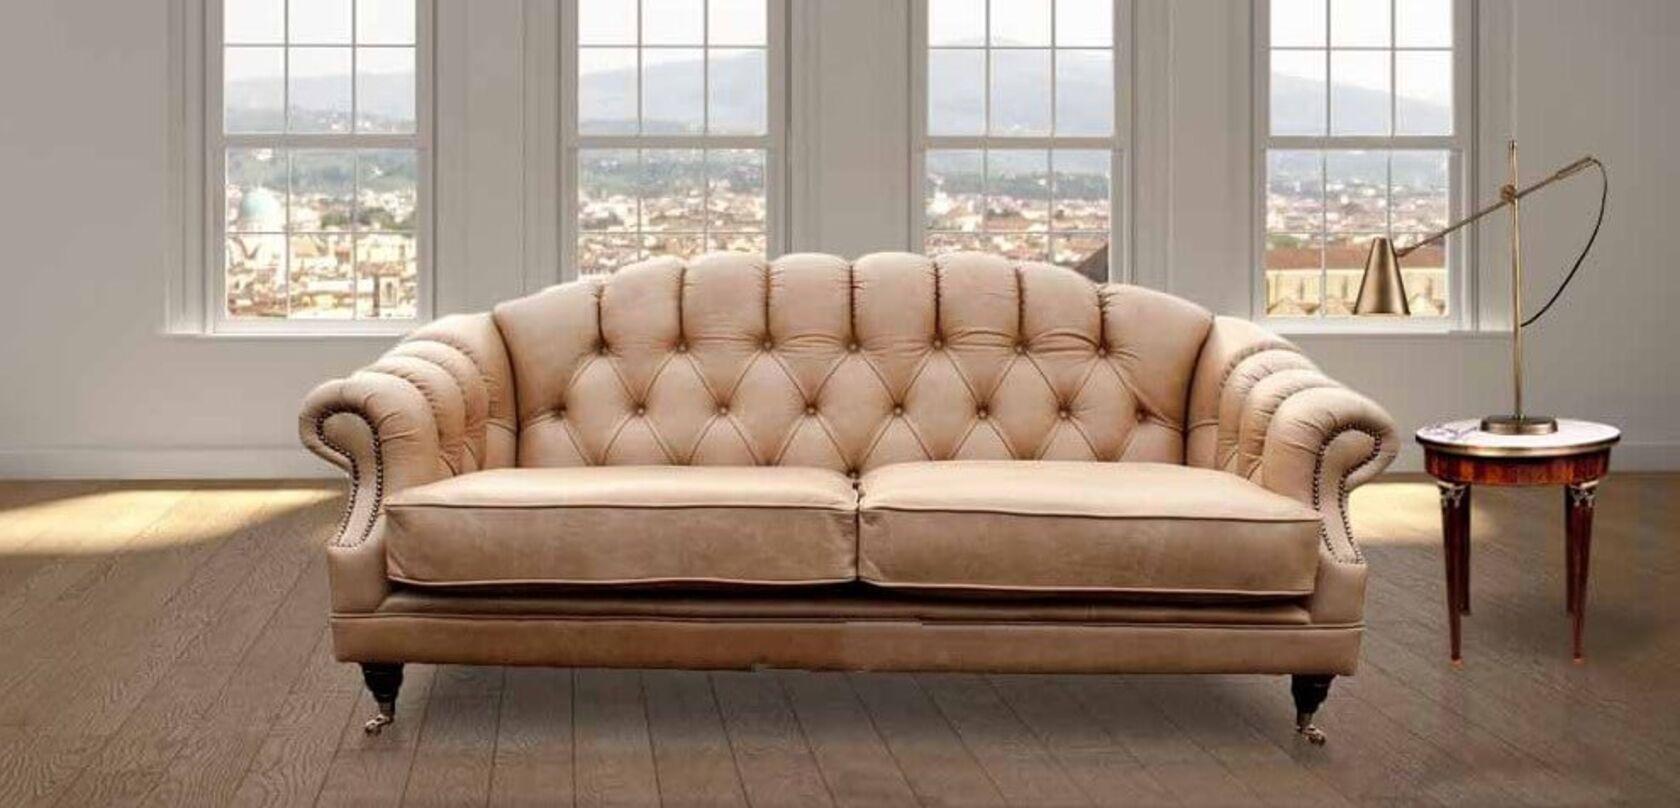 Victoria 3 Seater Chesterfield Sofa Settee Designersofas4u